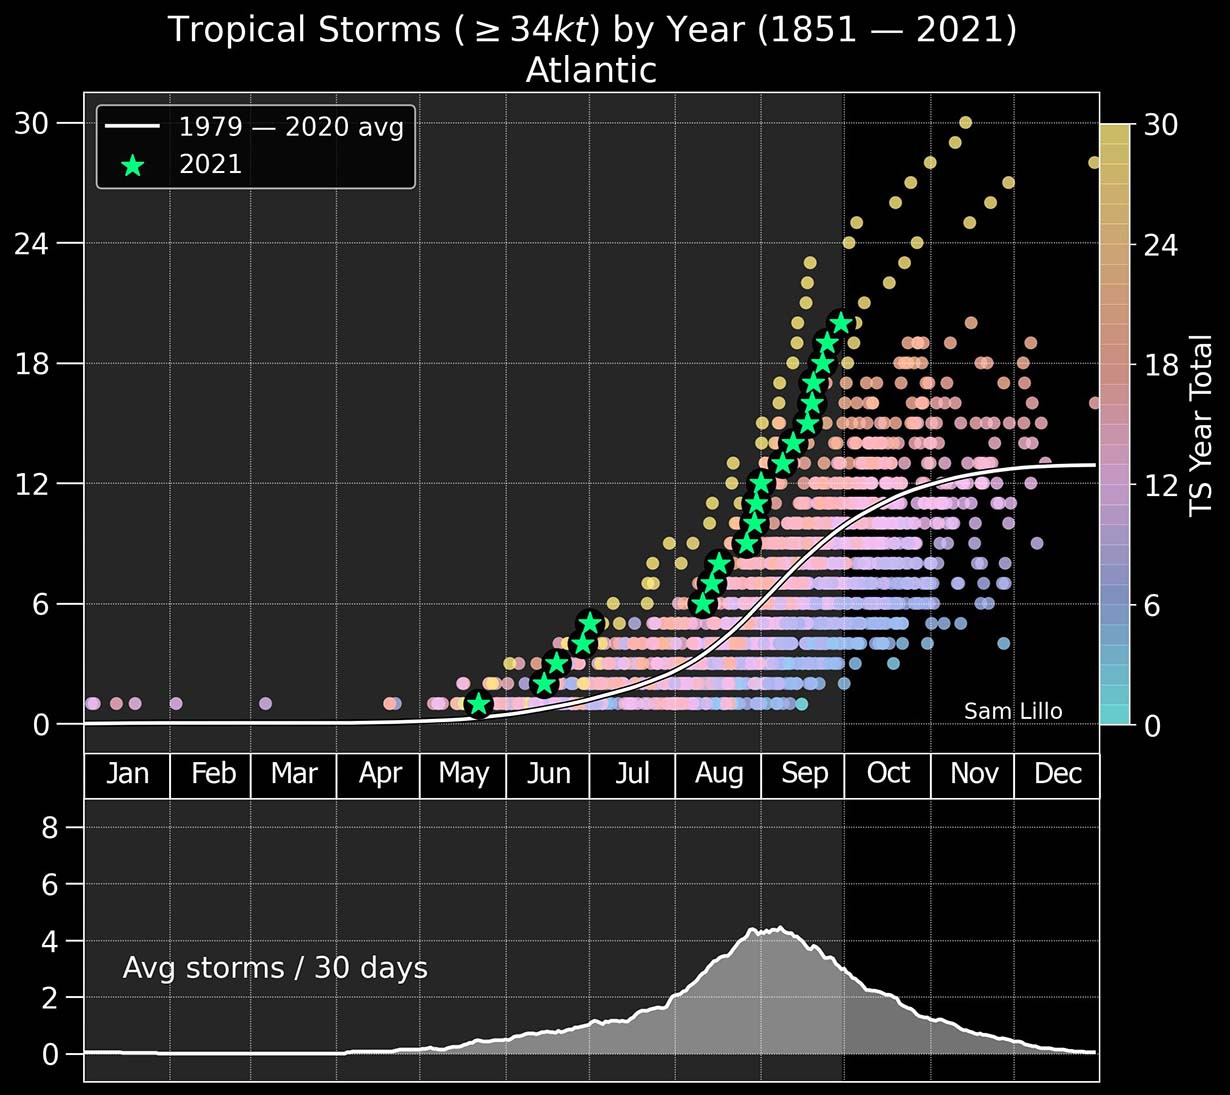 atlantic-hurricane-season-2021-most-powerful-storm-sam-bermuda-europe-2005-versus-2020